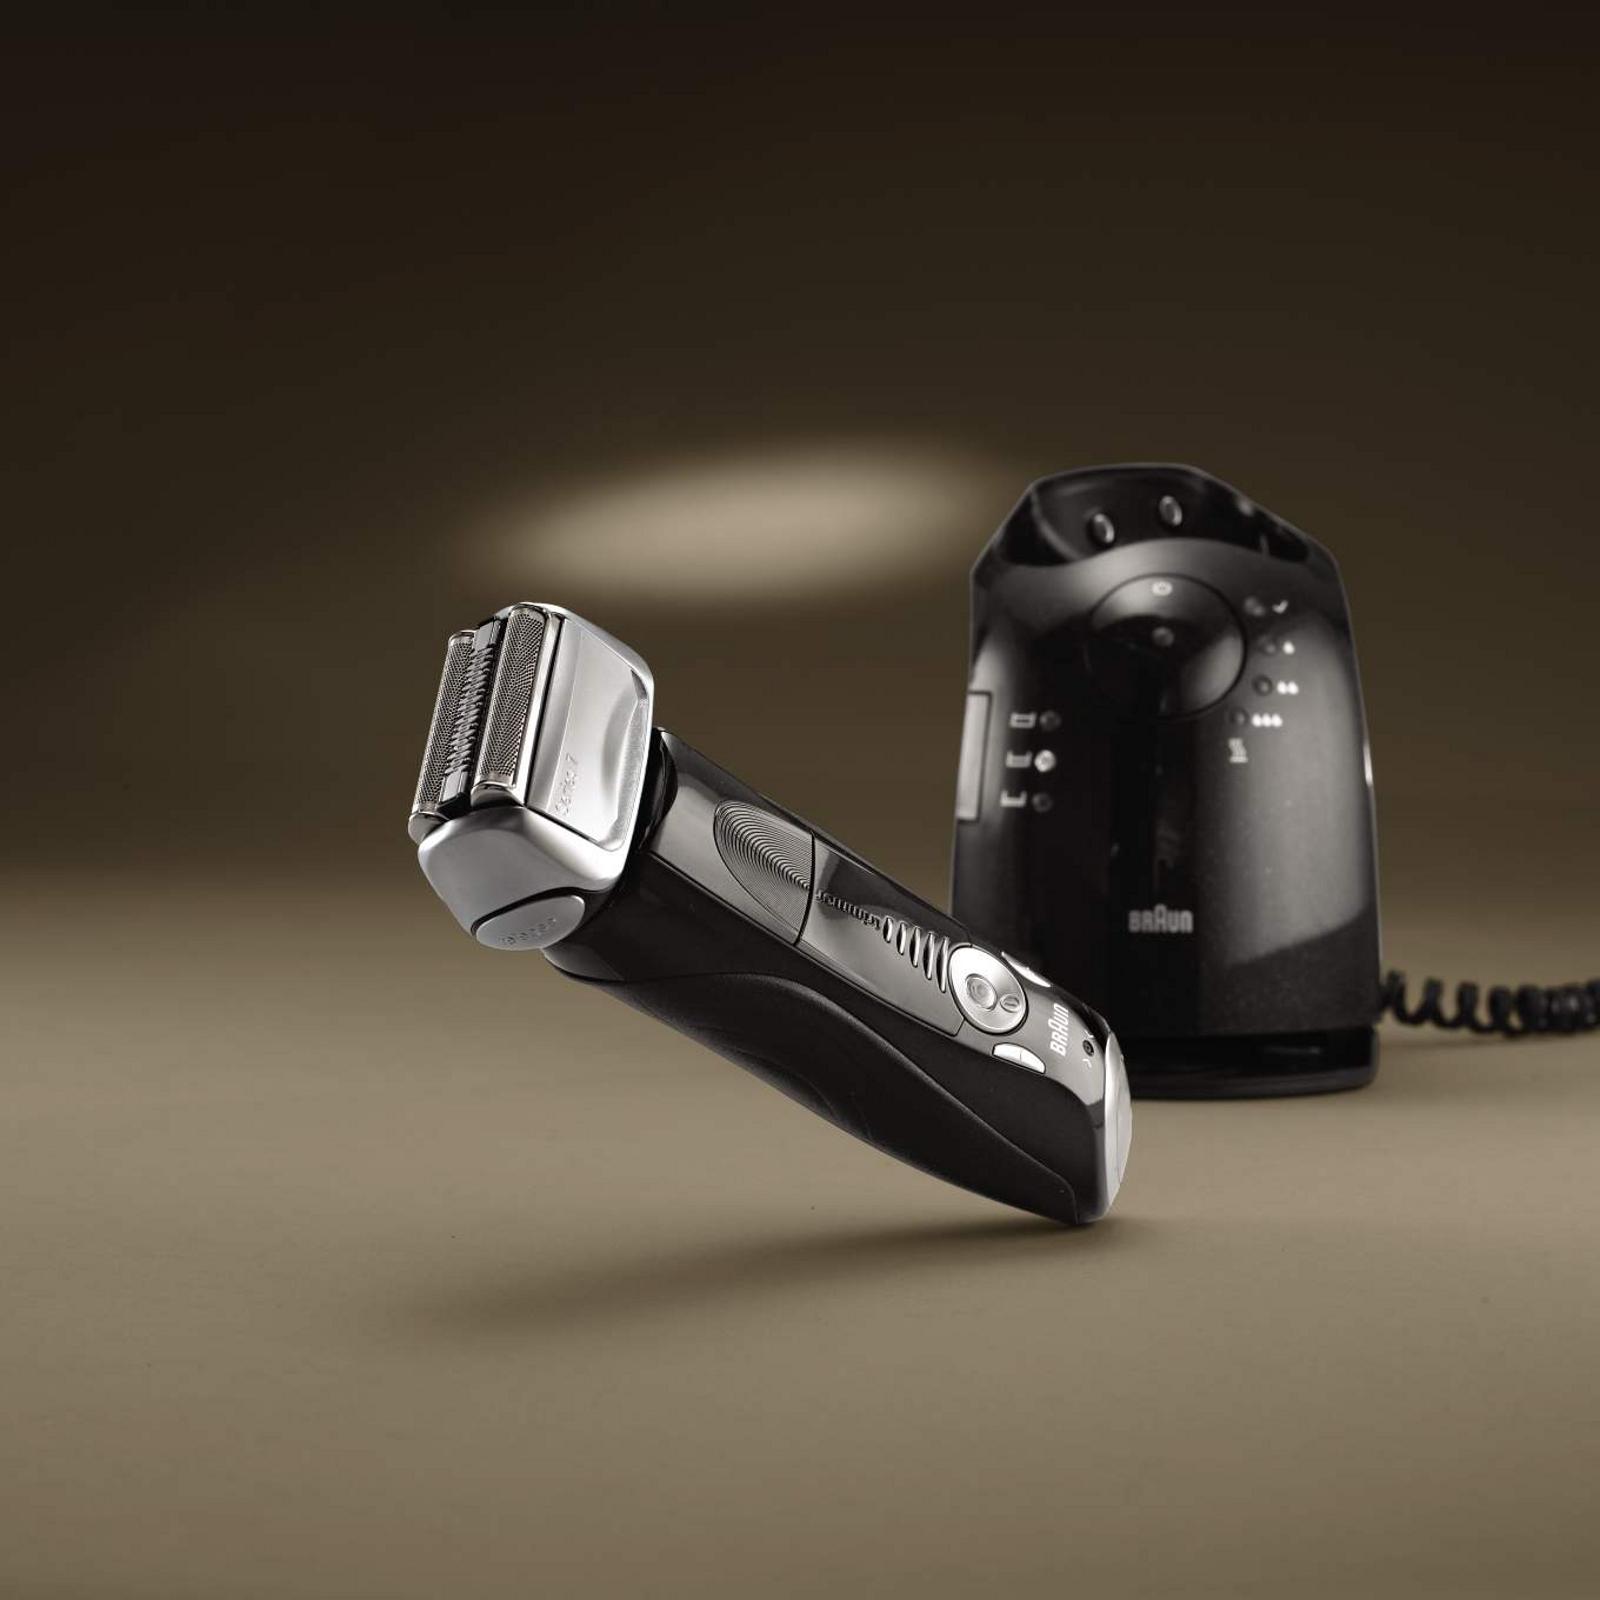 Braun Series 7 760CC Shaver